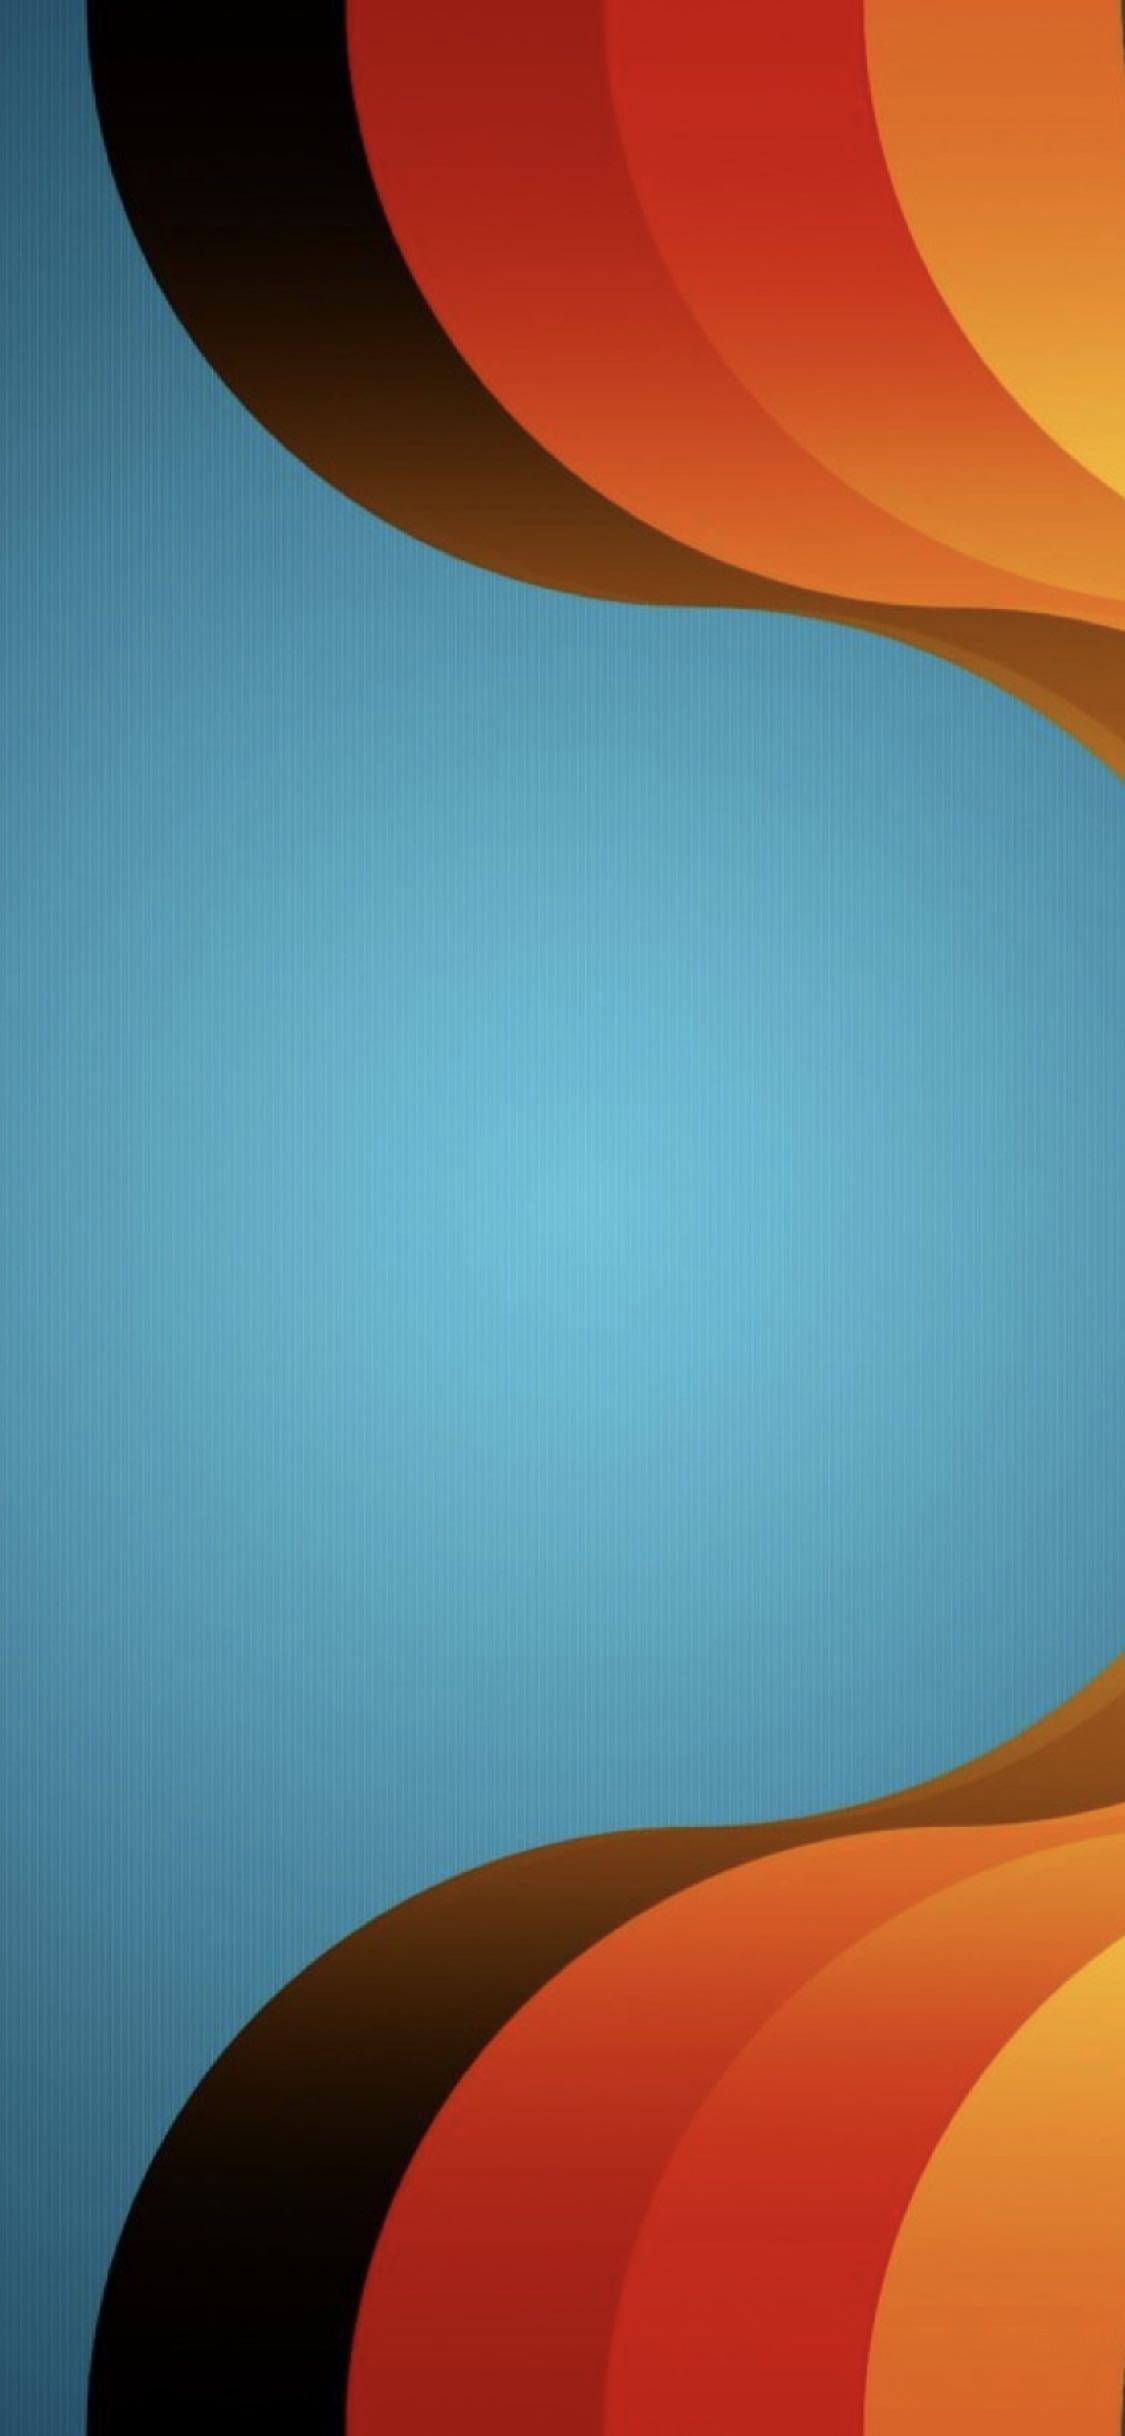 iPhone XS , iPhone X wallpaper 0435